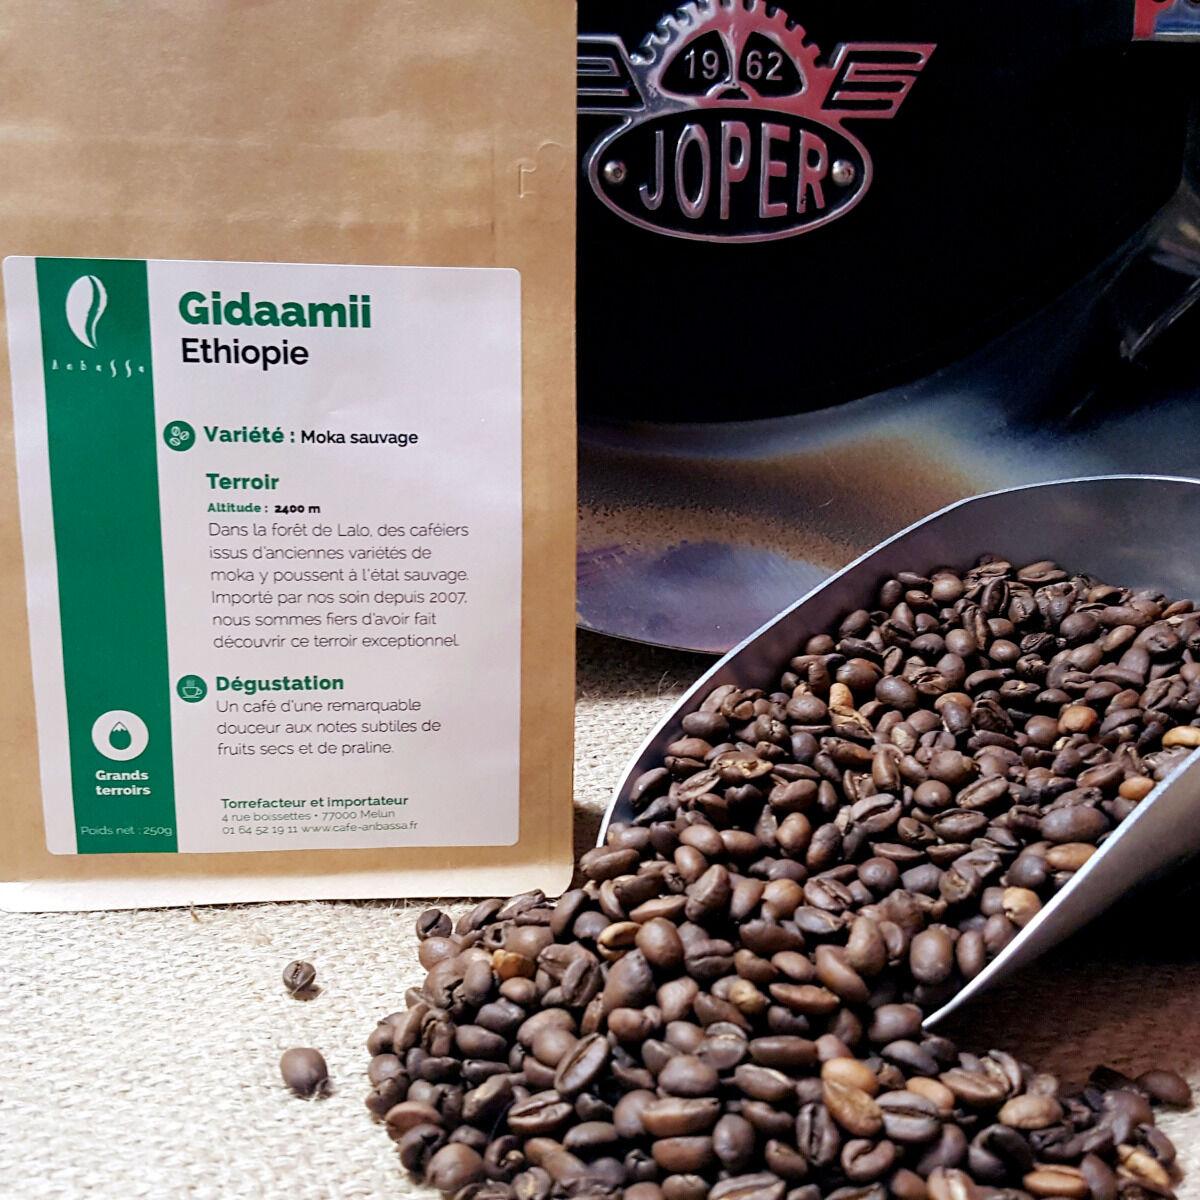 Brûlerie de Melun-Maison Anbassa Café Gidaamii-ethiopie - En Grains